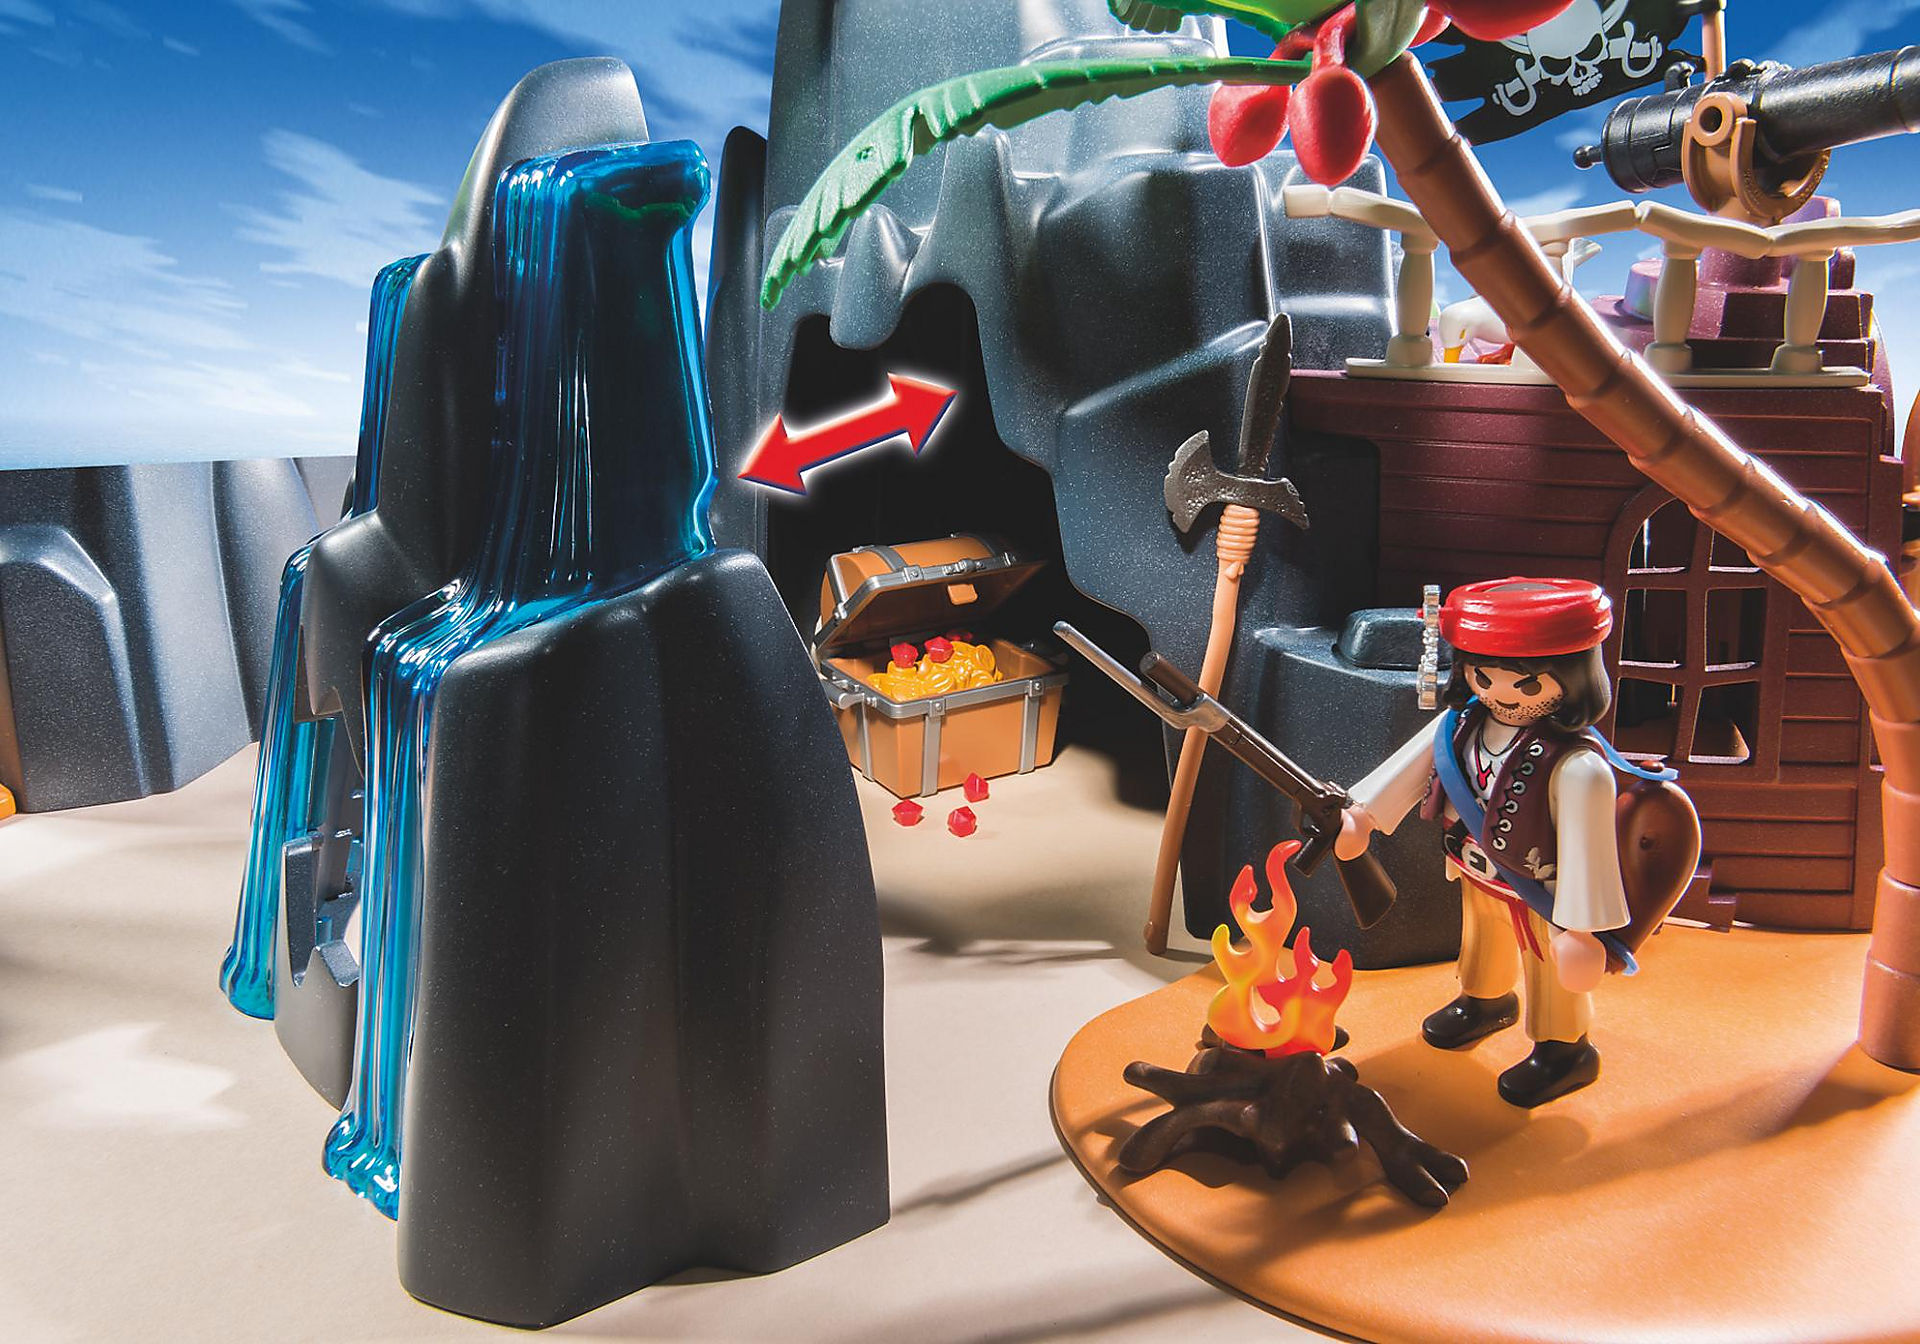 http://media.playmobil.com/i/playmobil/6679_product_extra1/Πειρατικό νησί θησαυρού